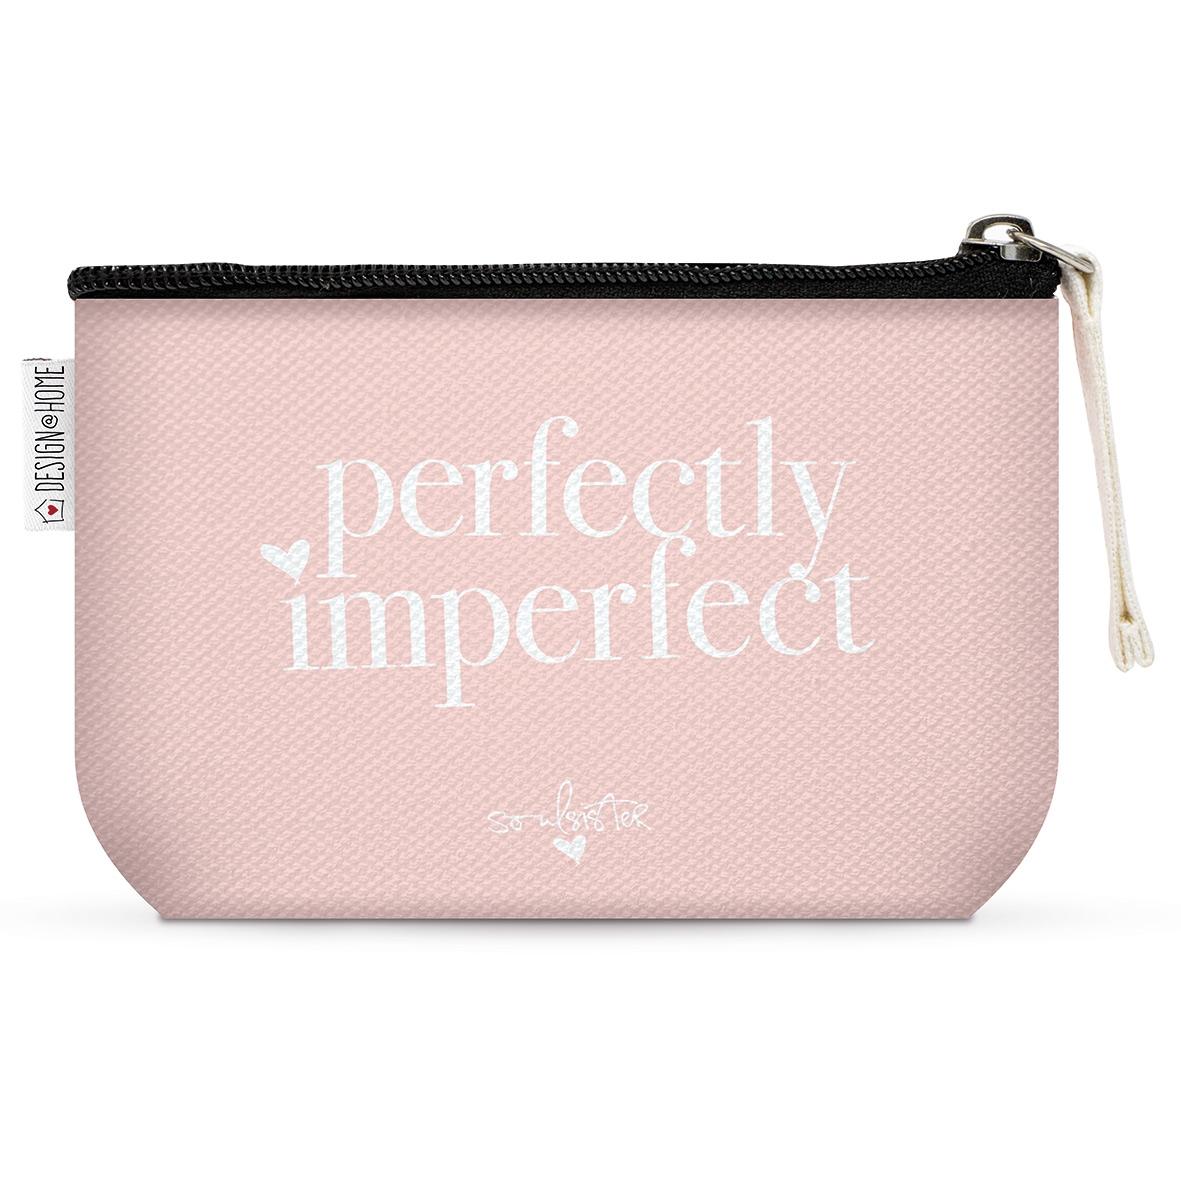 Bolsa de maquillaje - Perfectly Imperfect